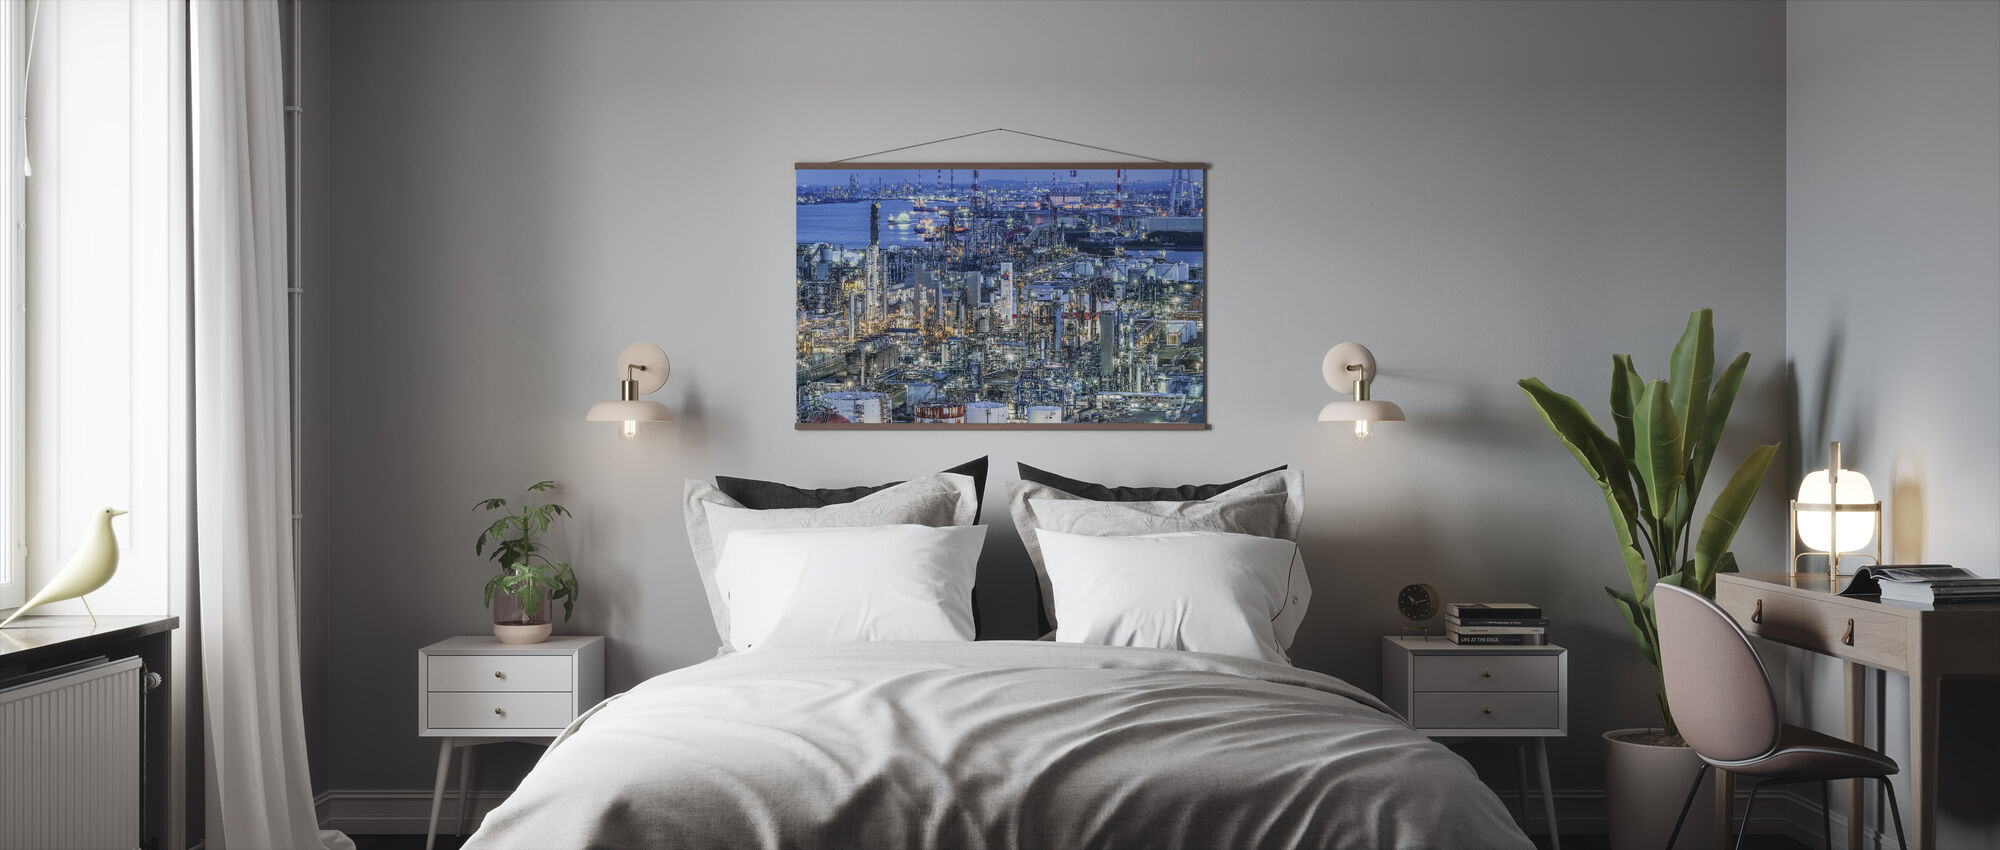 Coastal Industrial Area - Poster - Bedroom